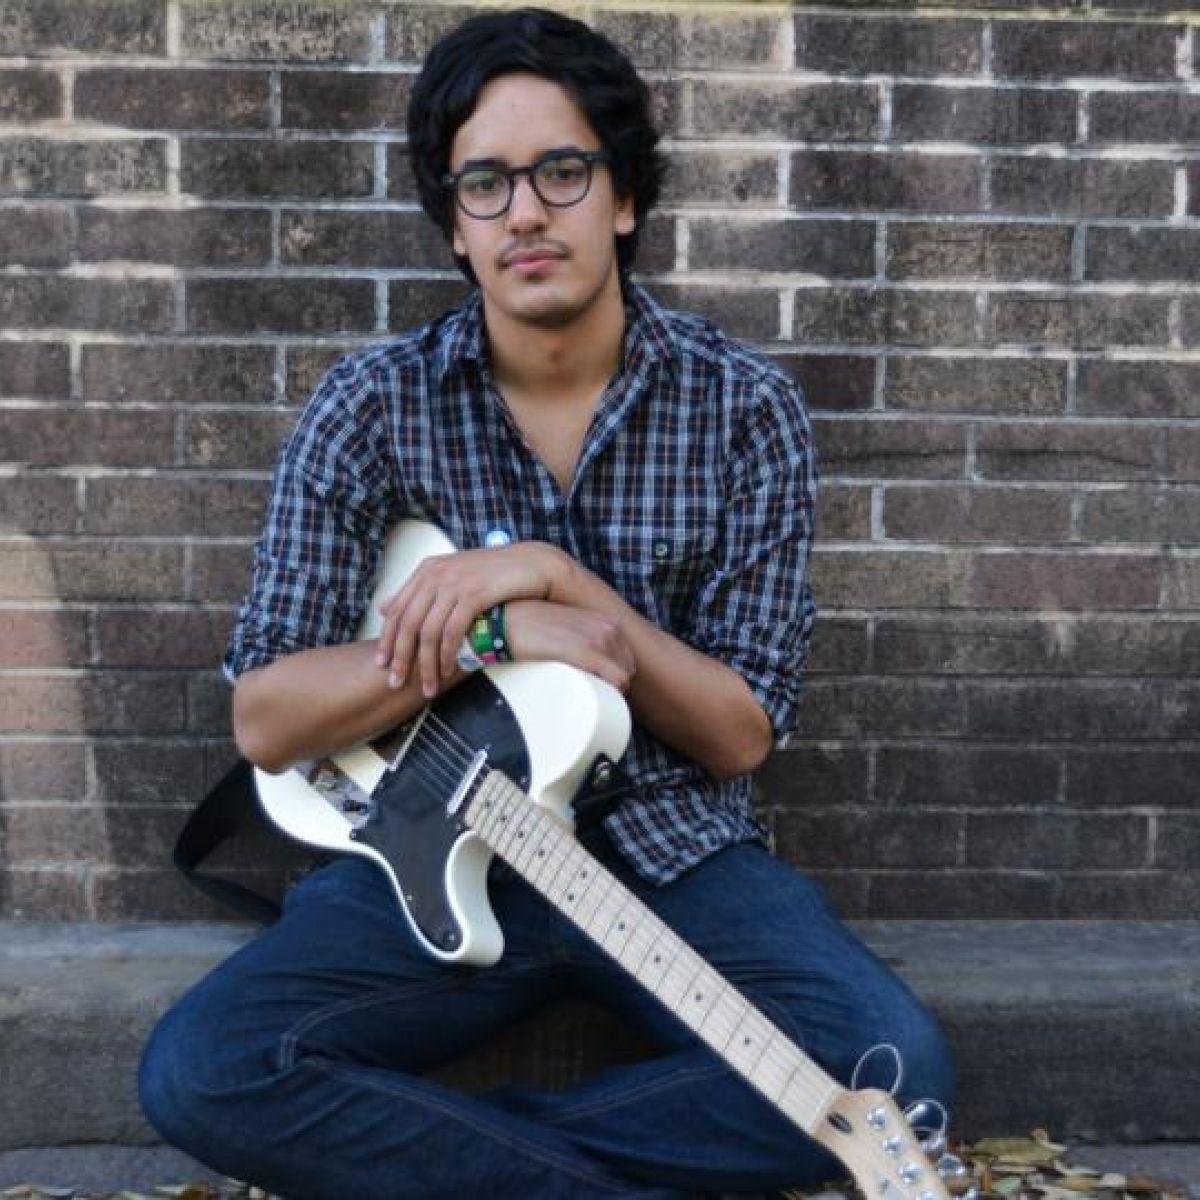 Luke Sital-Singh has come a long way from Slipknot